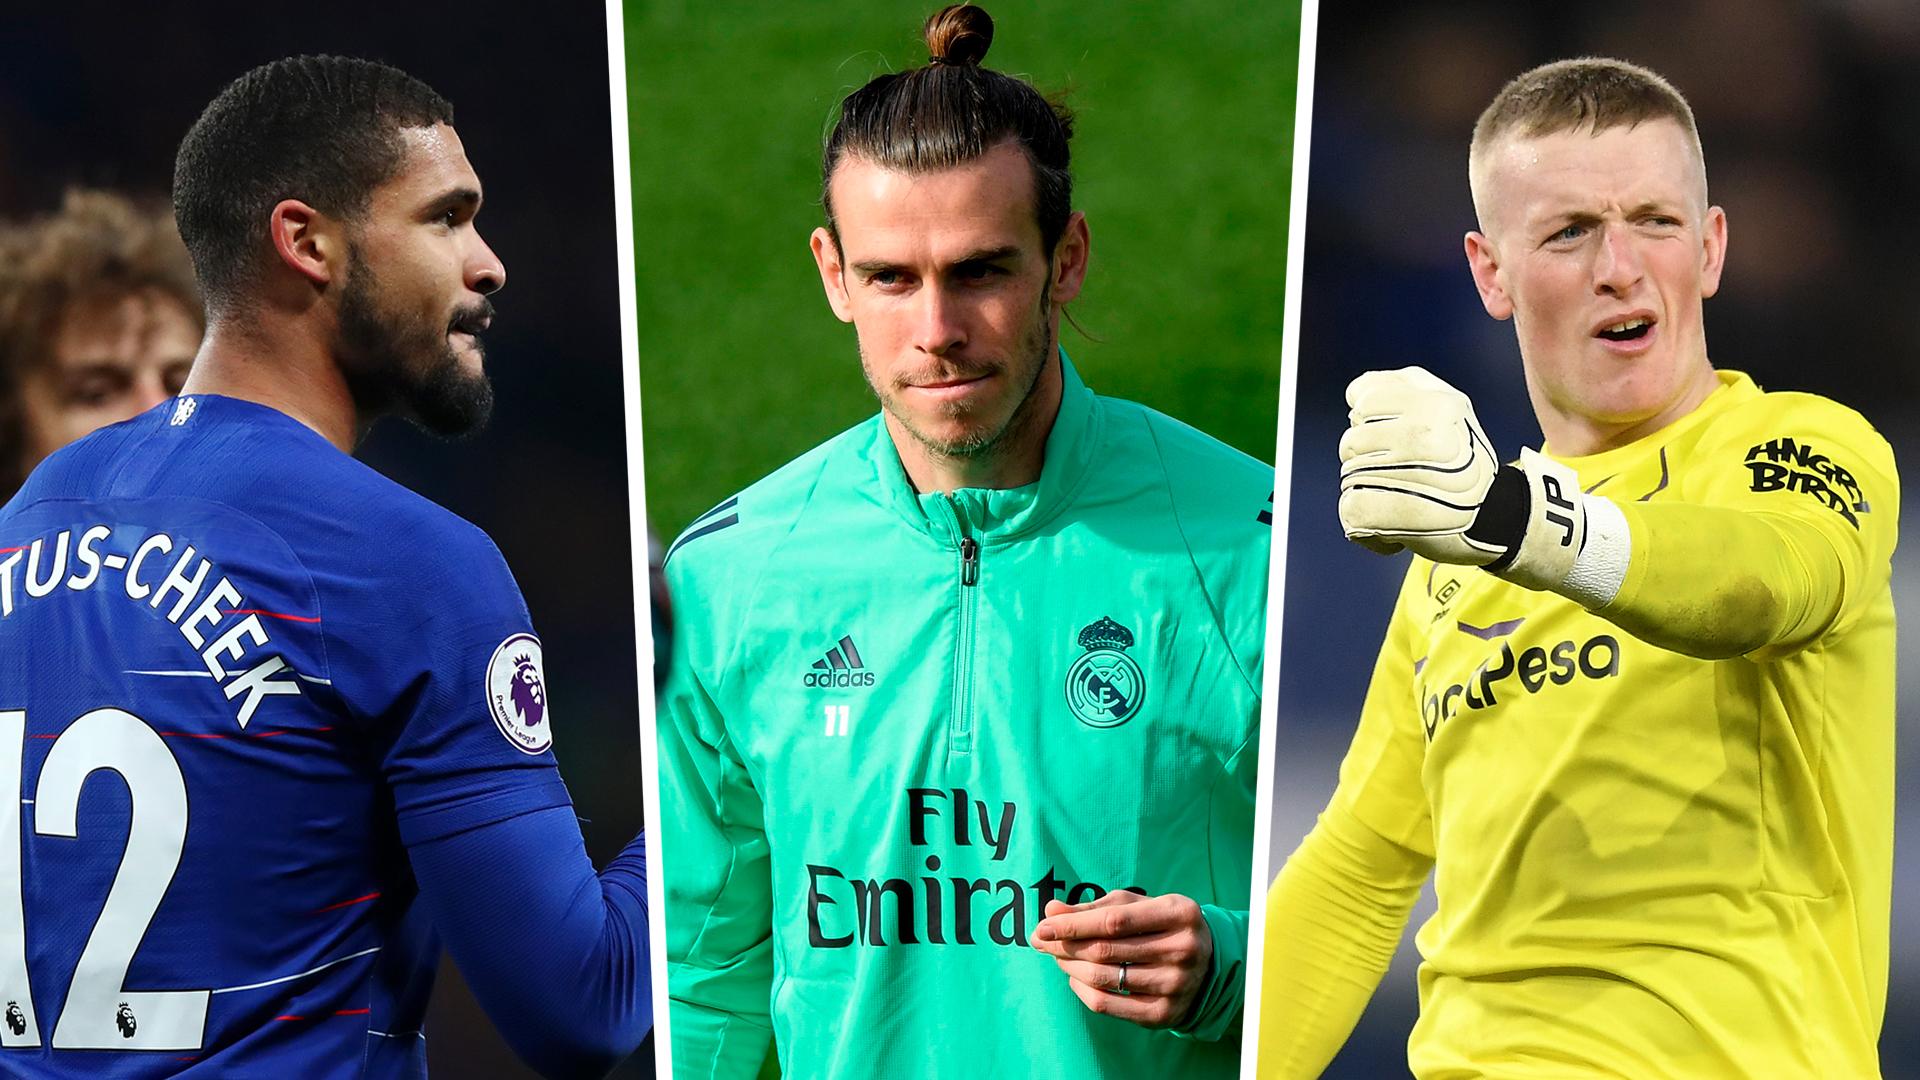 #CombatCorona: Bale, Loftus-Cheek & Pickford headline FIFA 20 charity tournament in Covid-19 battle